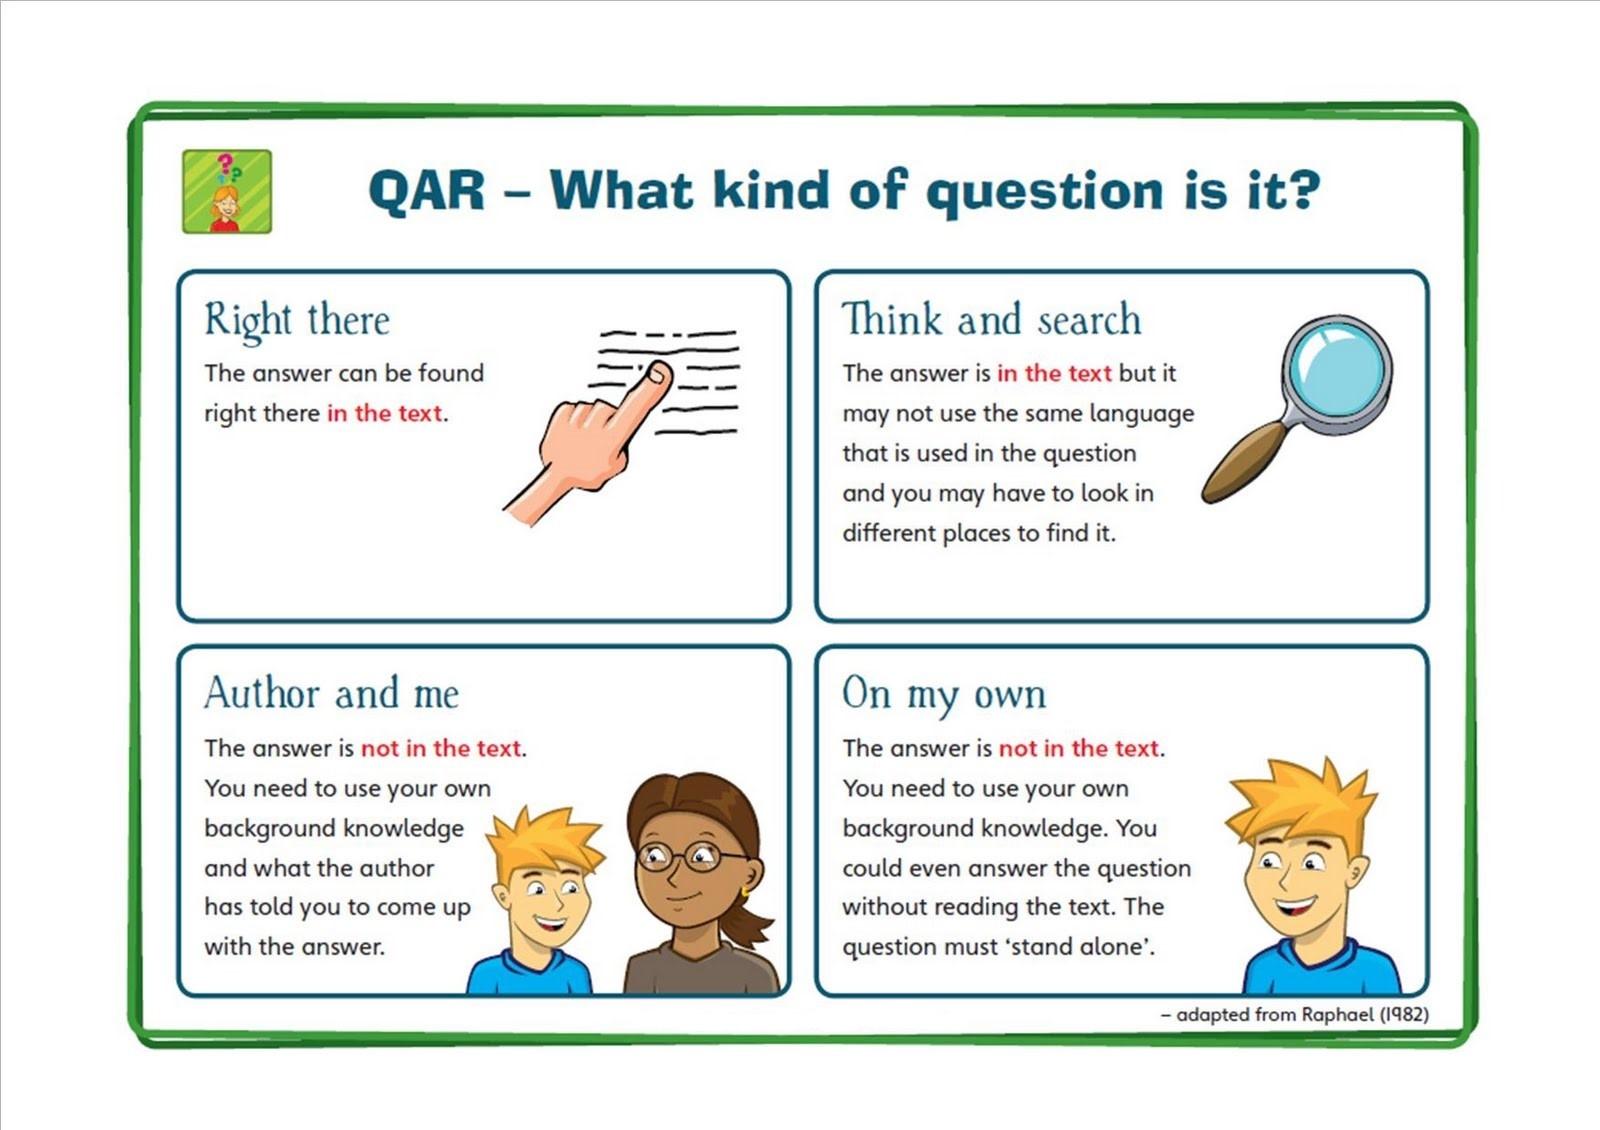 Qar A Reading Comprehension Strategy By Raphael And Au